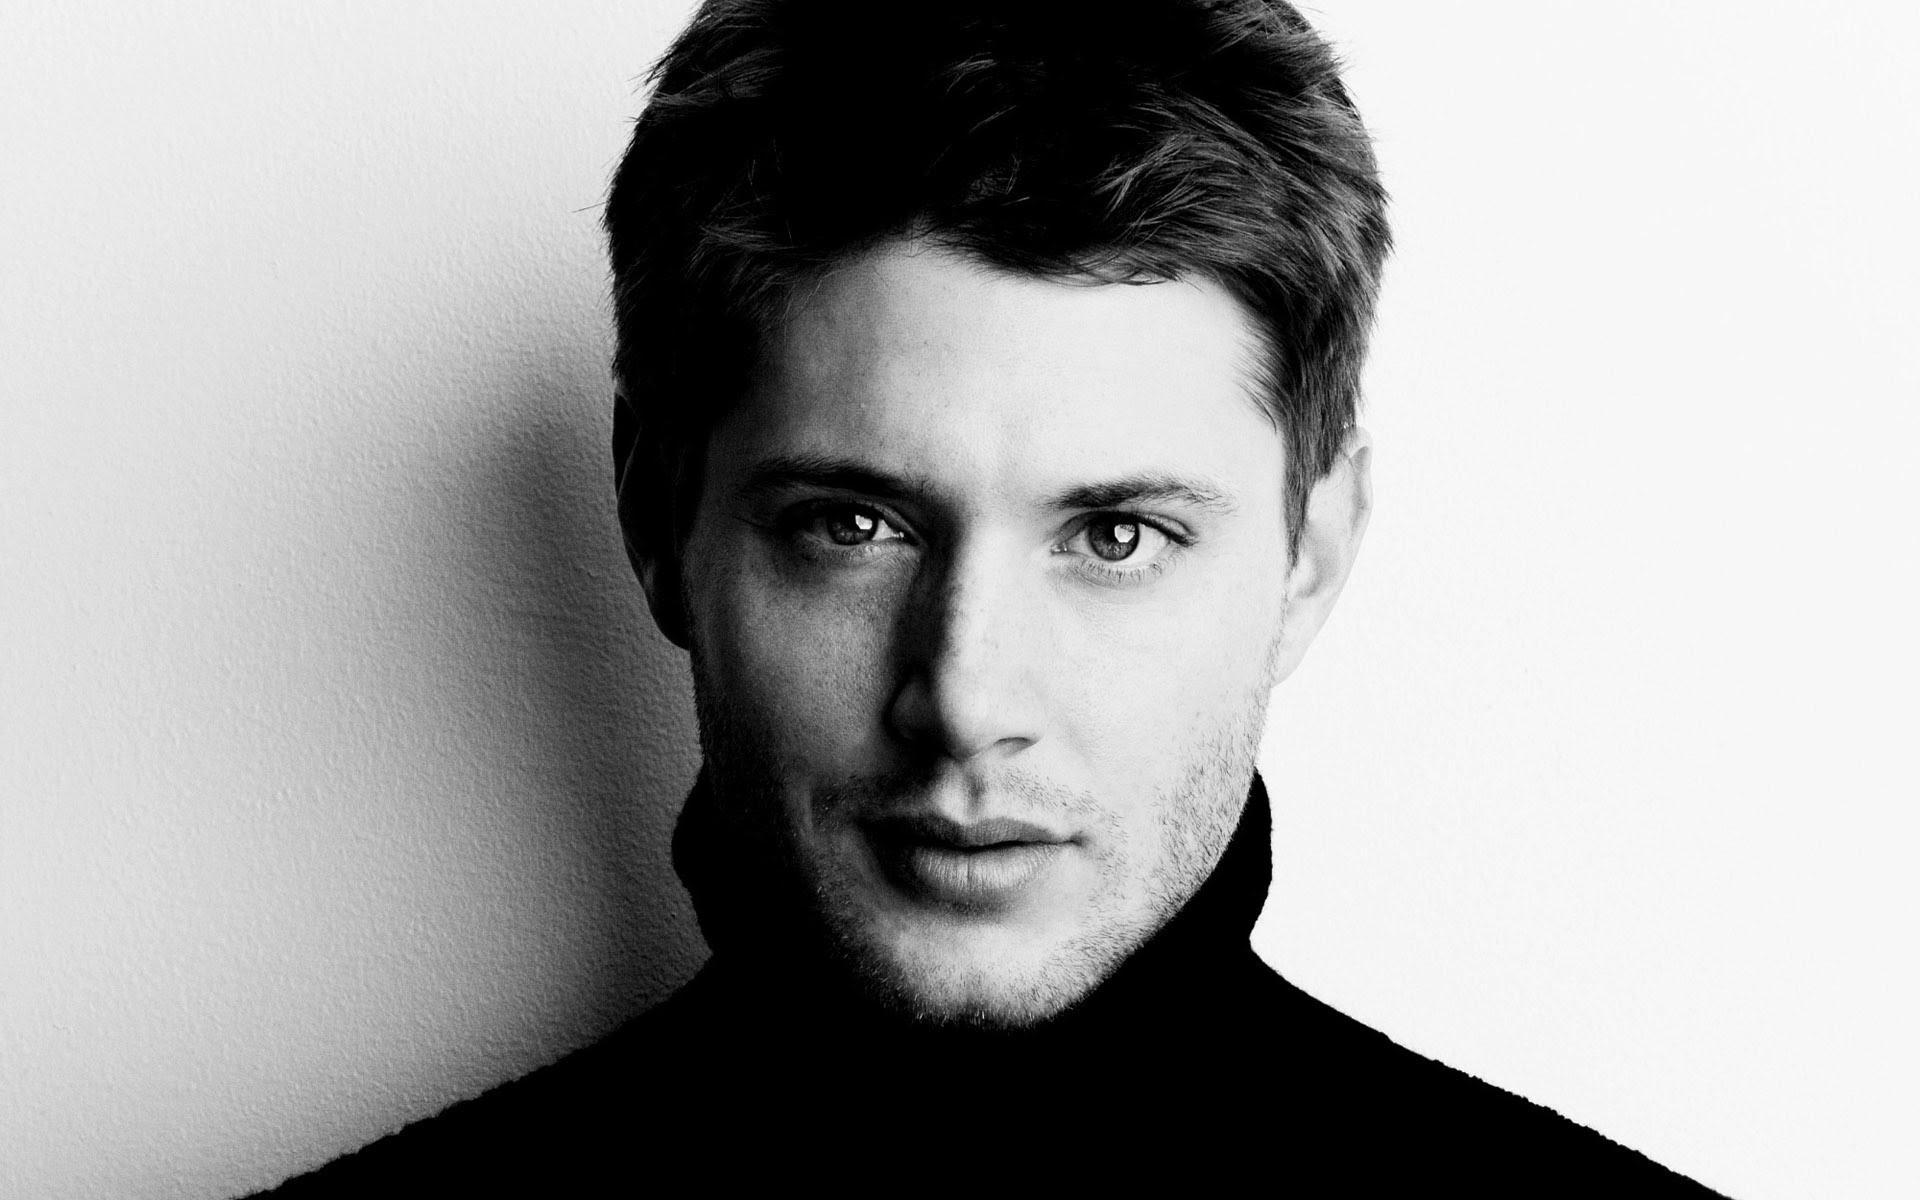 Jensen Ackles Wallpaper Download